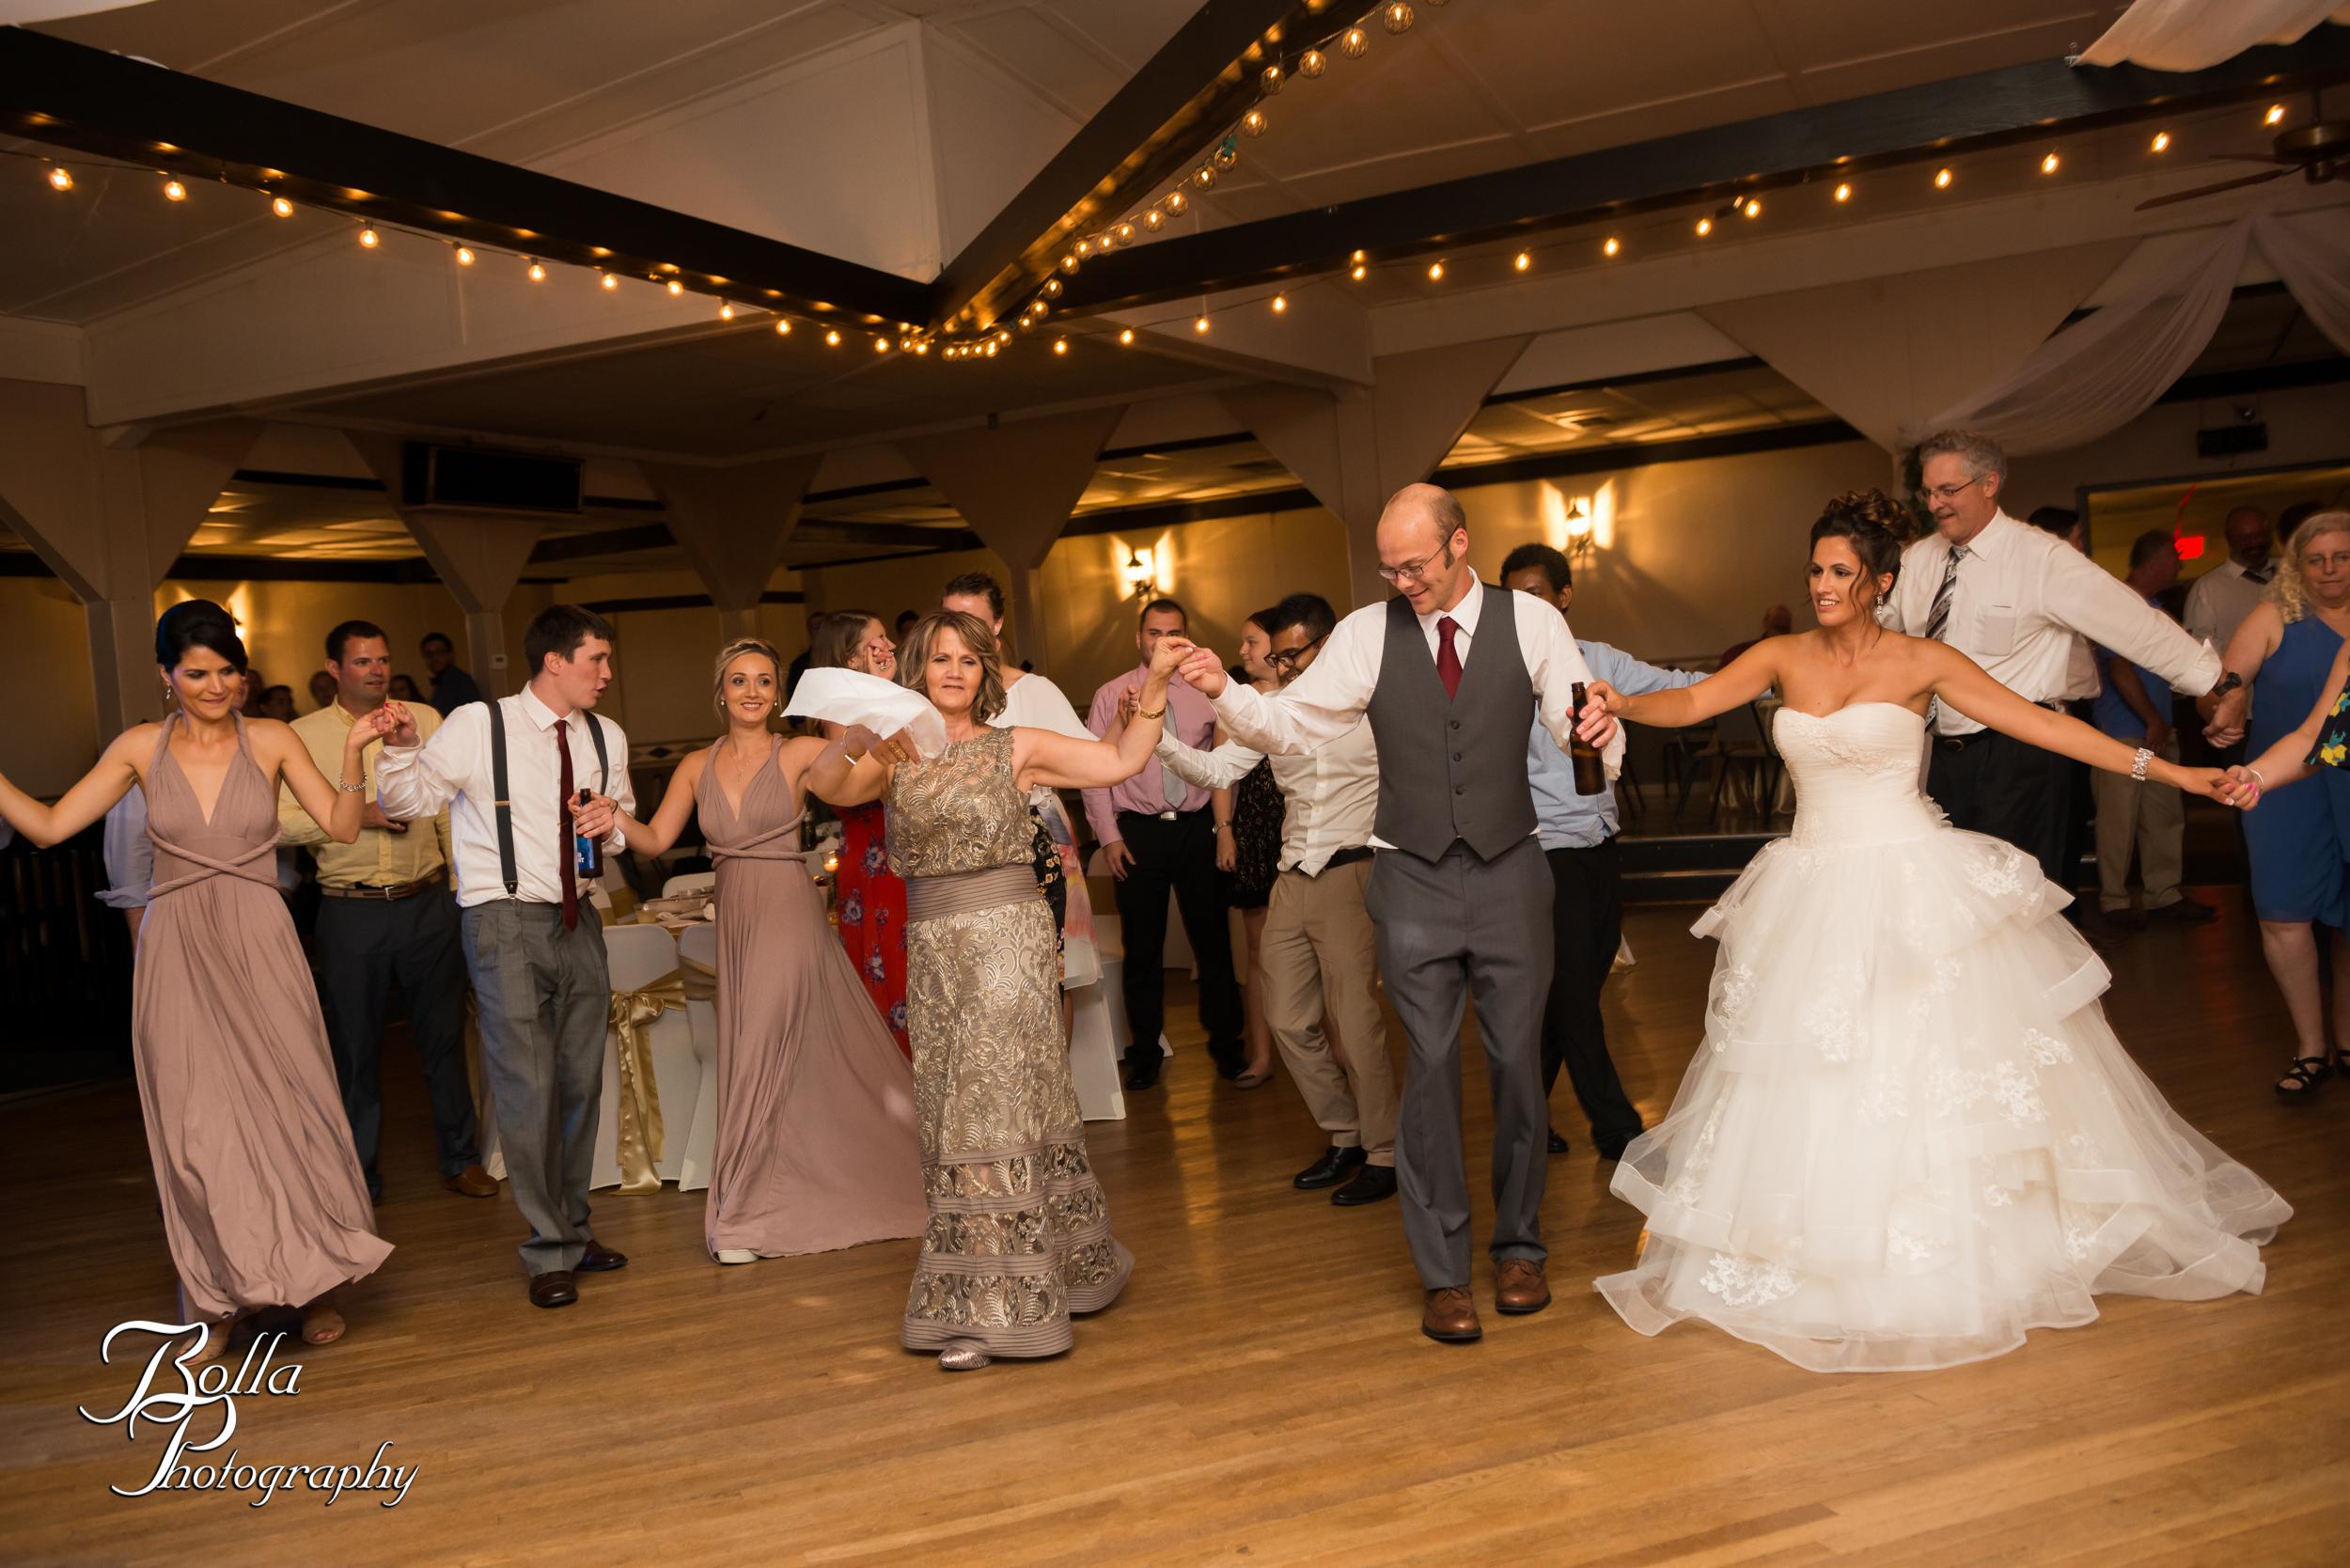 Bolla_photography_edwardsville_wedding_photographer_st_louis_weddings_Highland_outdoor_ceremony_Louis_Latzer_Homestead_Theims-0511.jpg